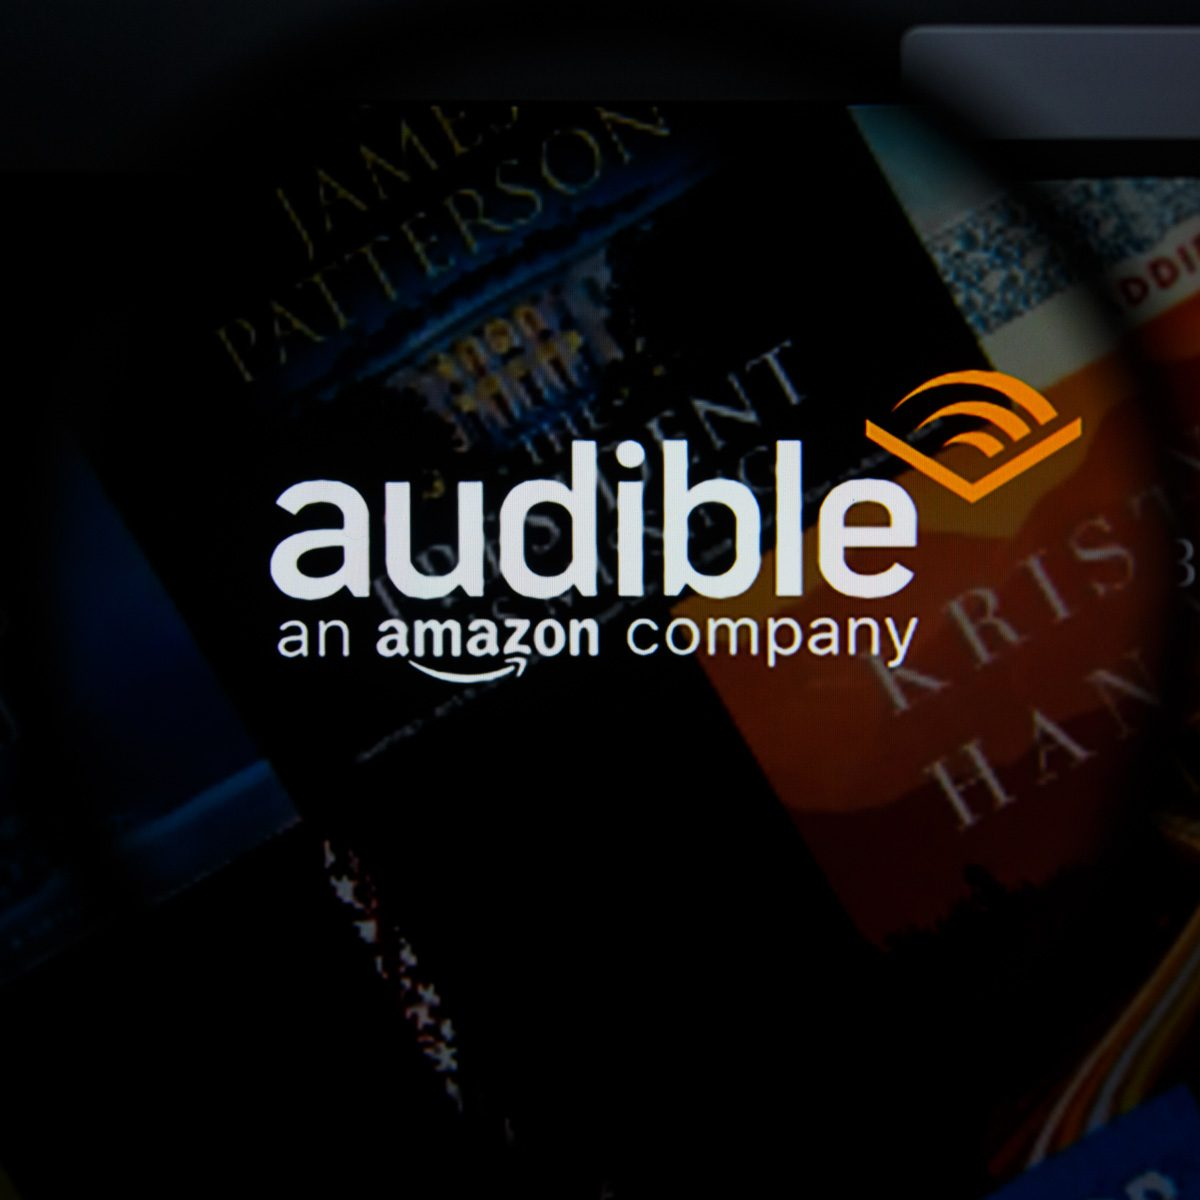 audible amazon app